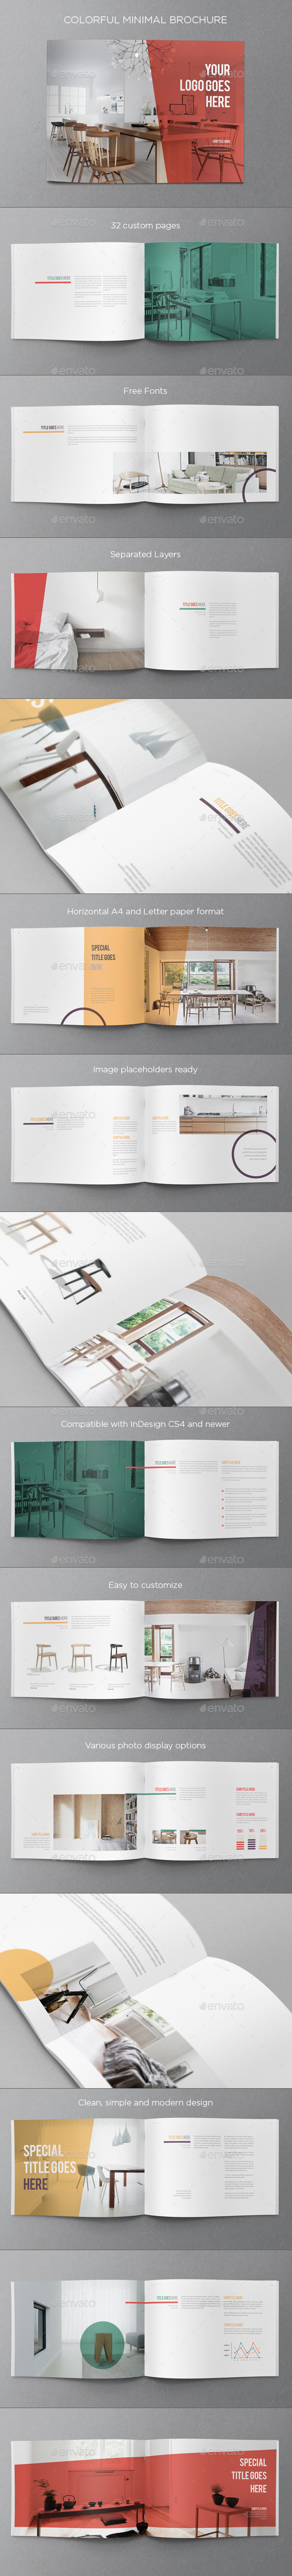 Colorful Minimal Brochure - Brochures Print Templates